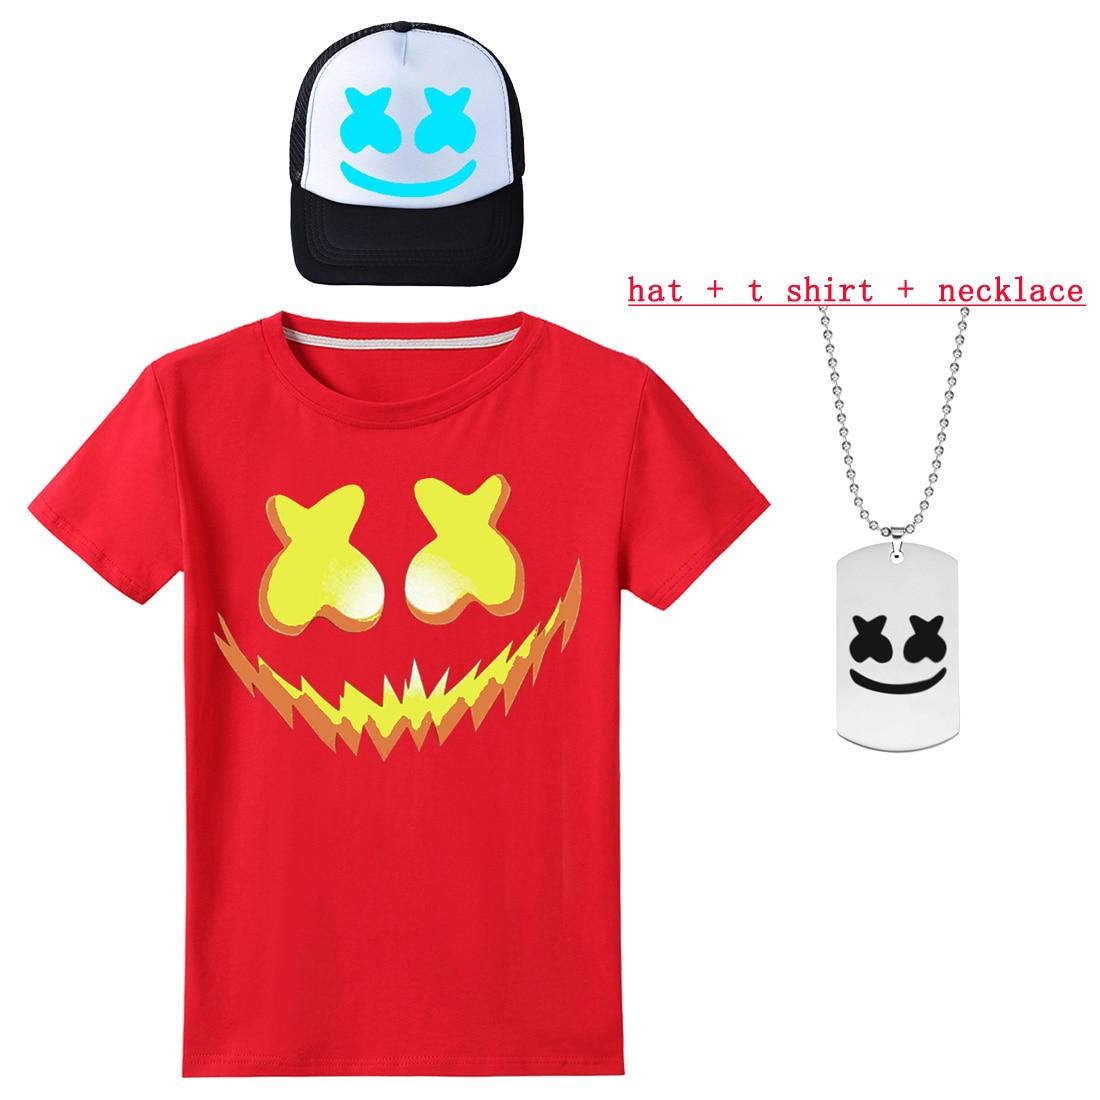 Roblox Luminous Hat Boy Short Sleeves T Shirts For Dj Music Girls